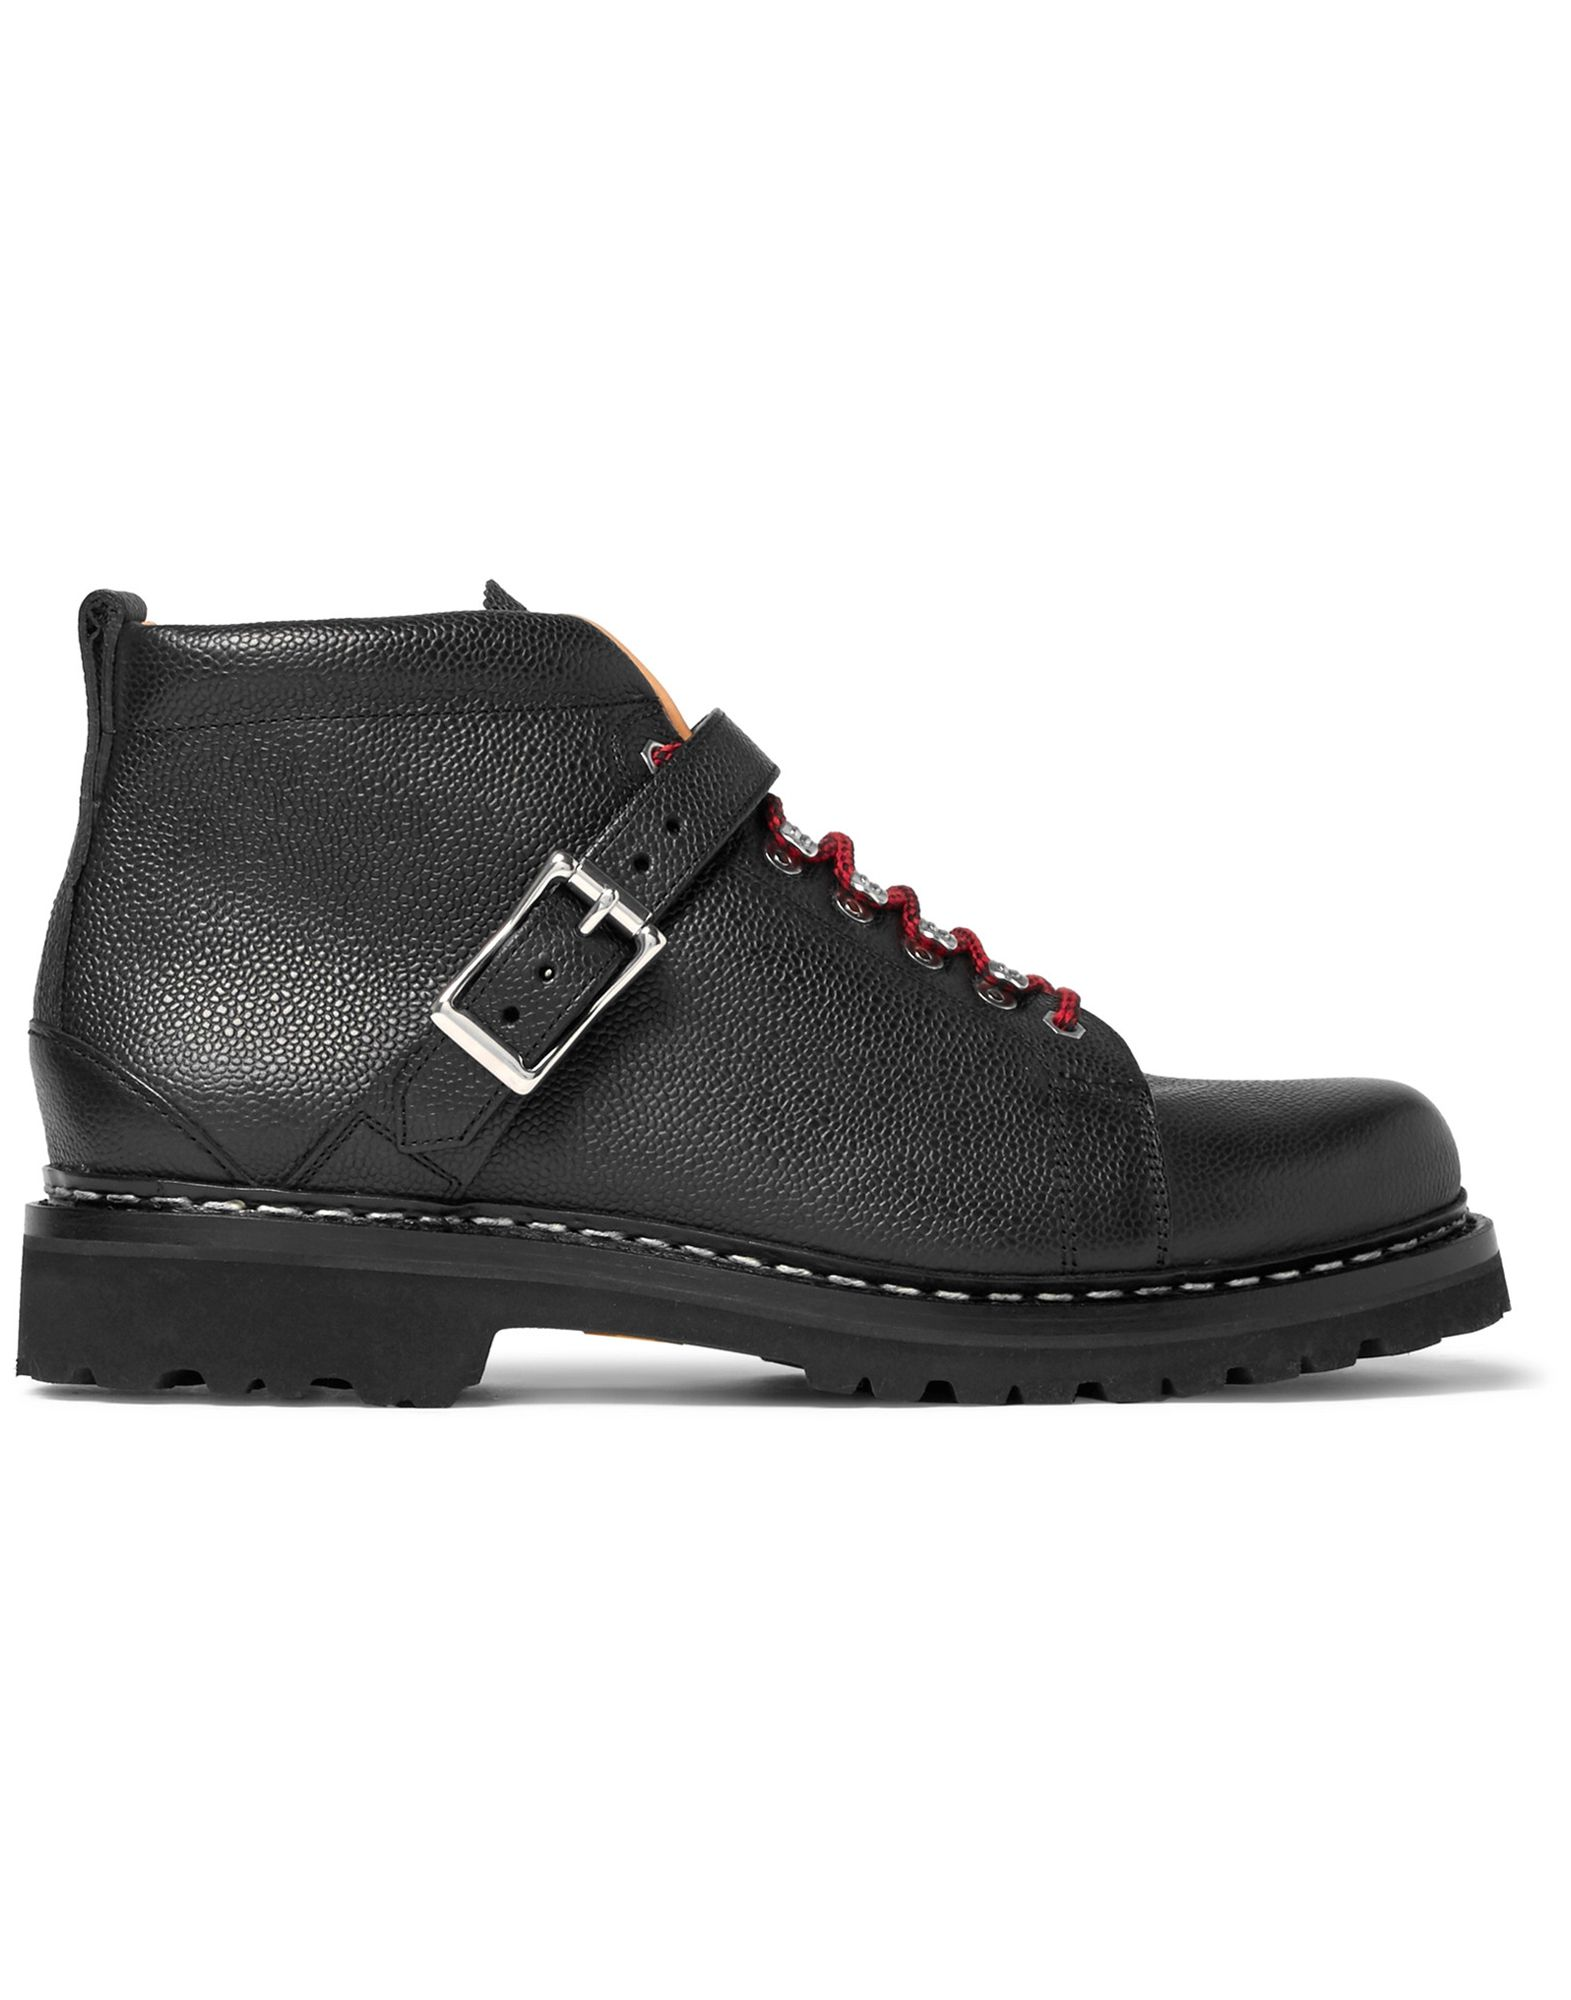 Ateliers Heschung Stiefelette Herren  11540444GI Gute Qualität beliebte Schuhe